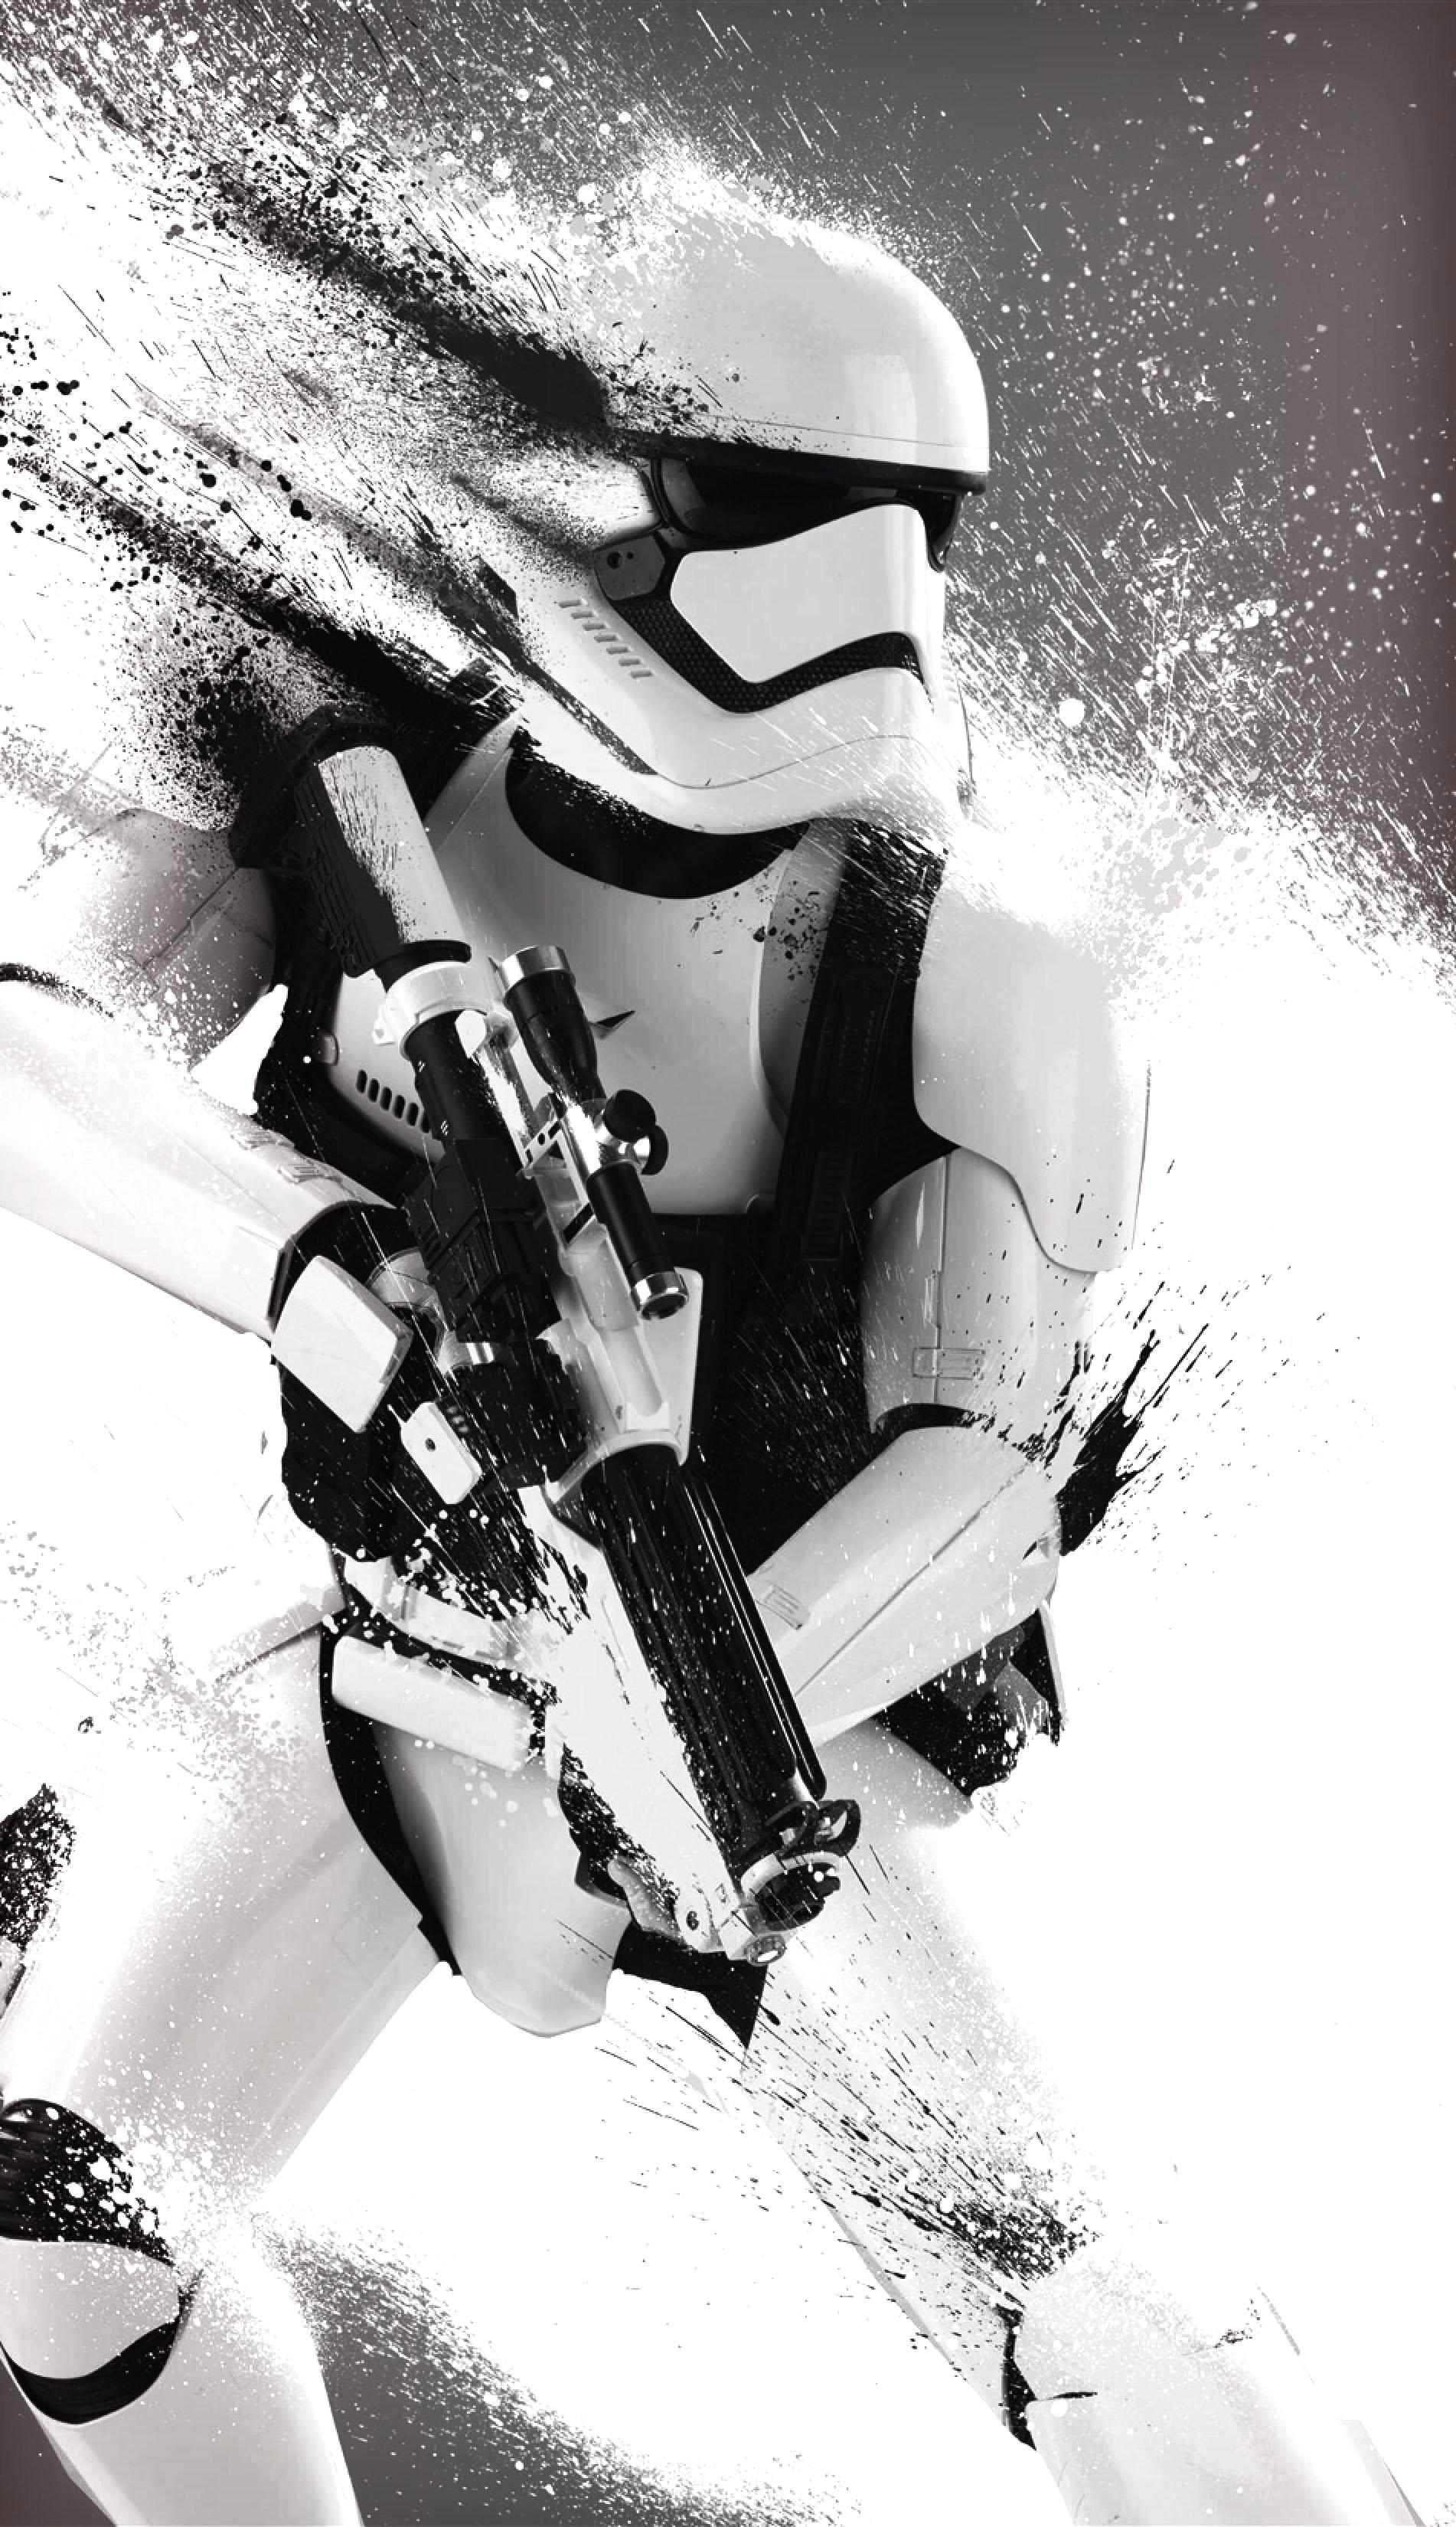 vertical wallpapers first order – photo #48. L'image du jour : Le fond  d'cran Star Wars ultra classe .